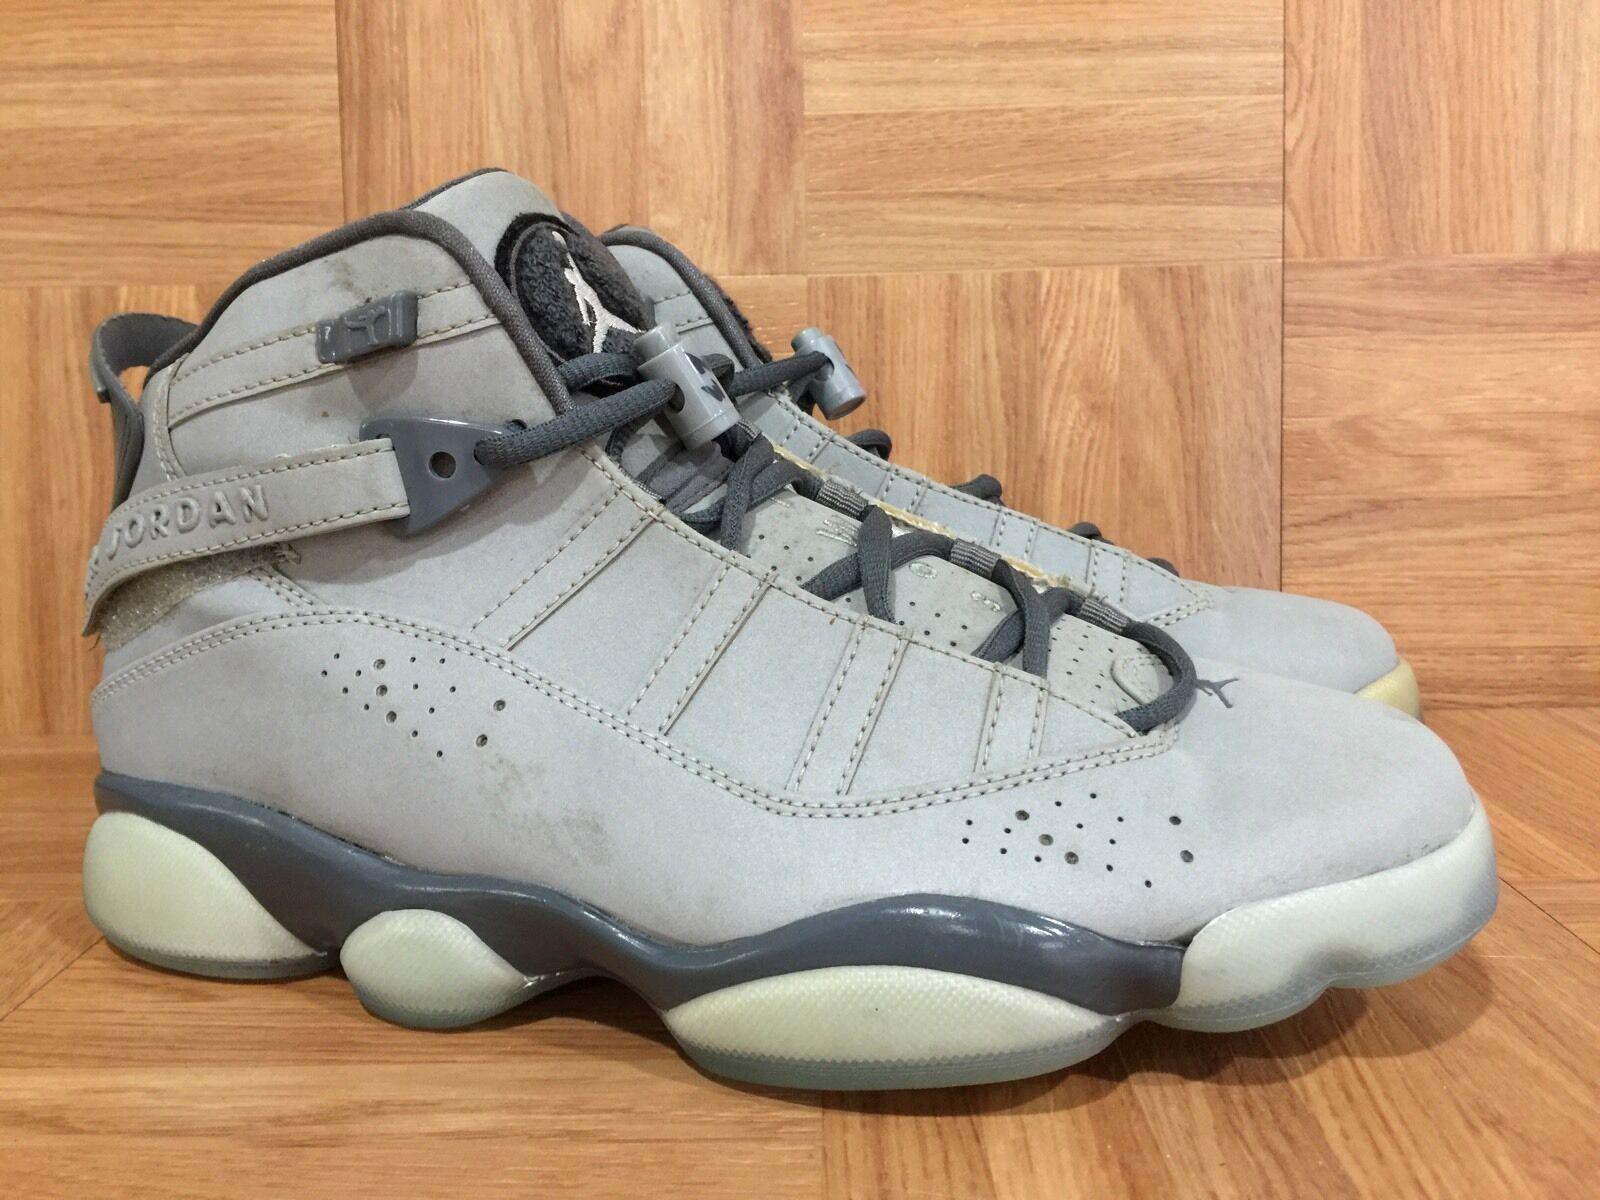 RARE Nike Air Jordan 6 Rings 3M Silver Graphite Sz 8 322992-001 Basketball LE